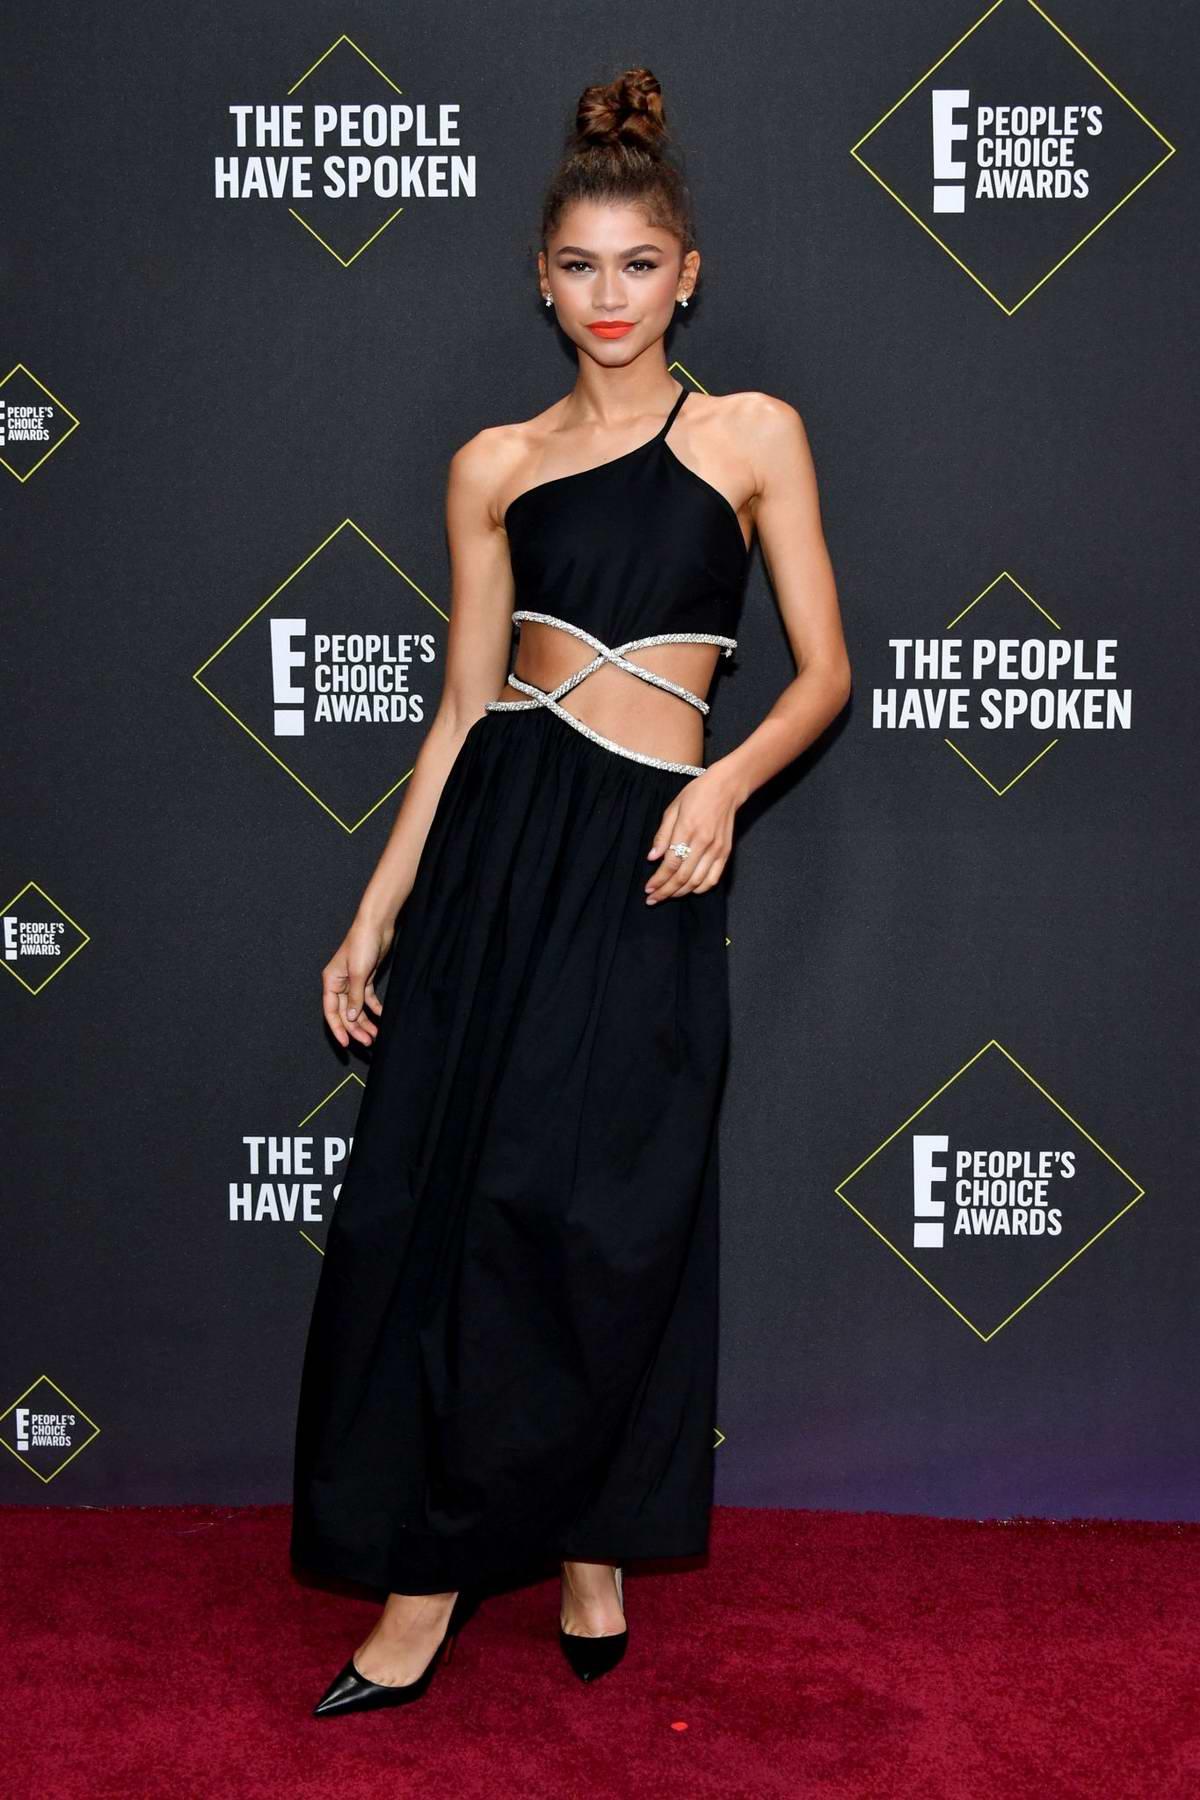 Zendaya attends the 2019 E! People's Choice Awards held at the Barker Hangar in Santa Monica, California